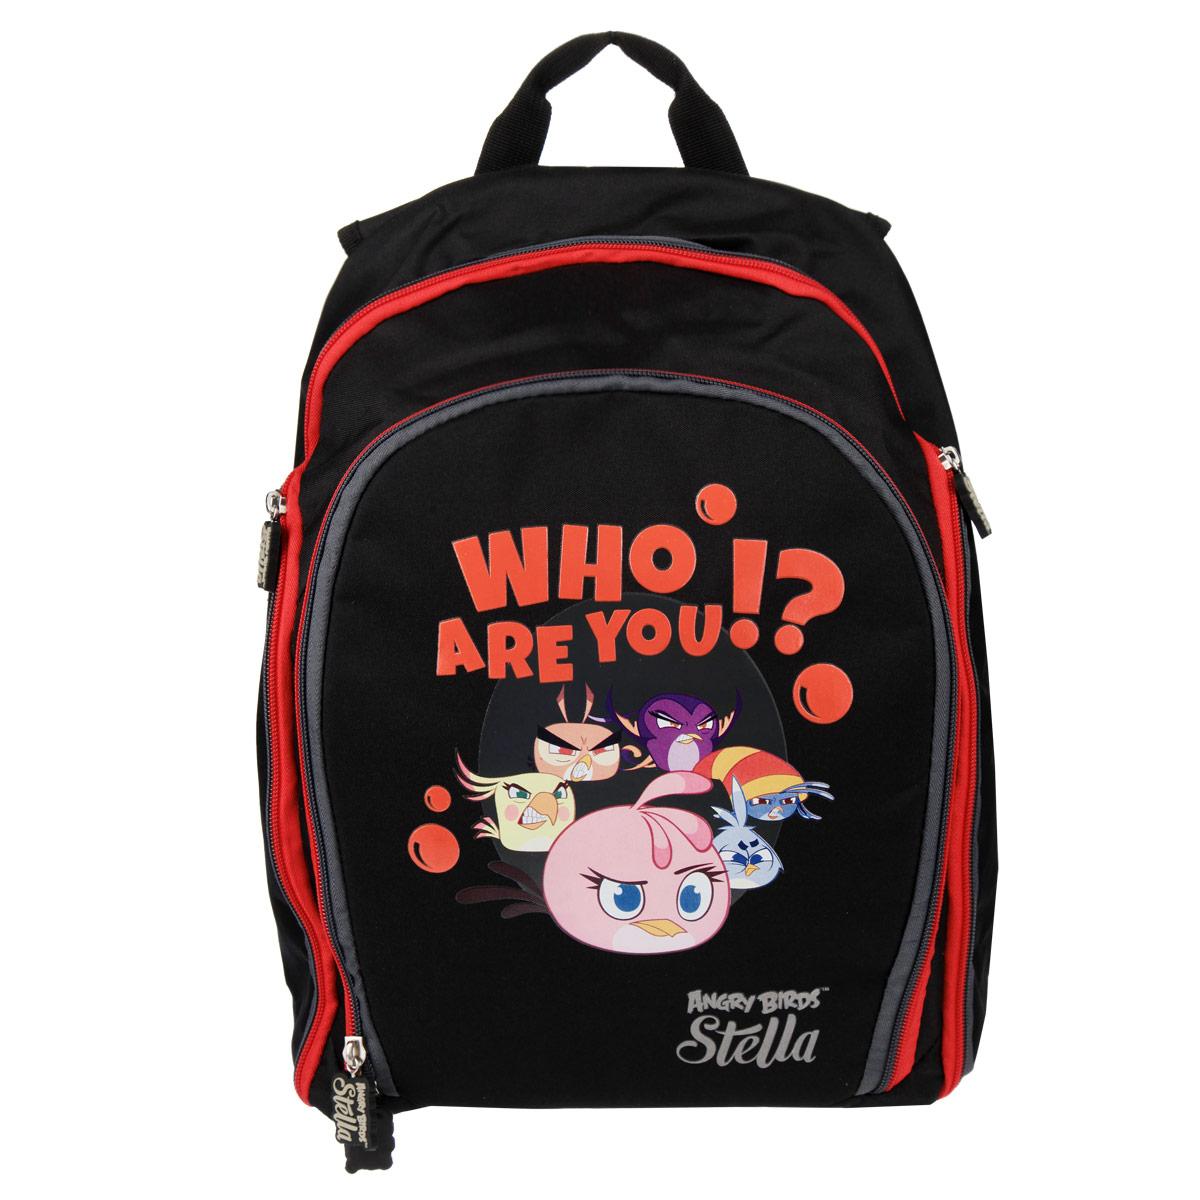 Рюкзак Action! Angry Birds Stella, цвет: черный, красный, серый цена